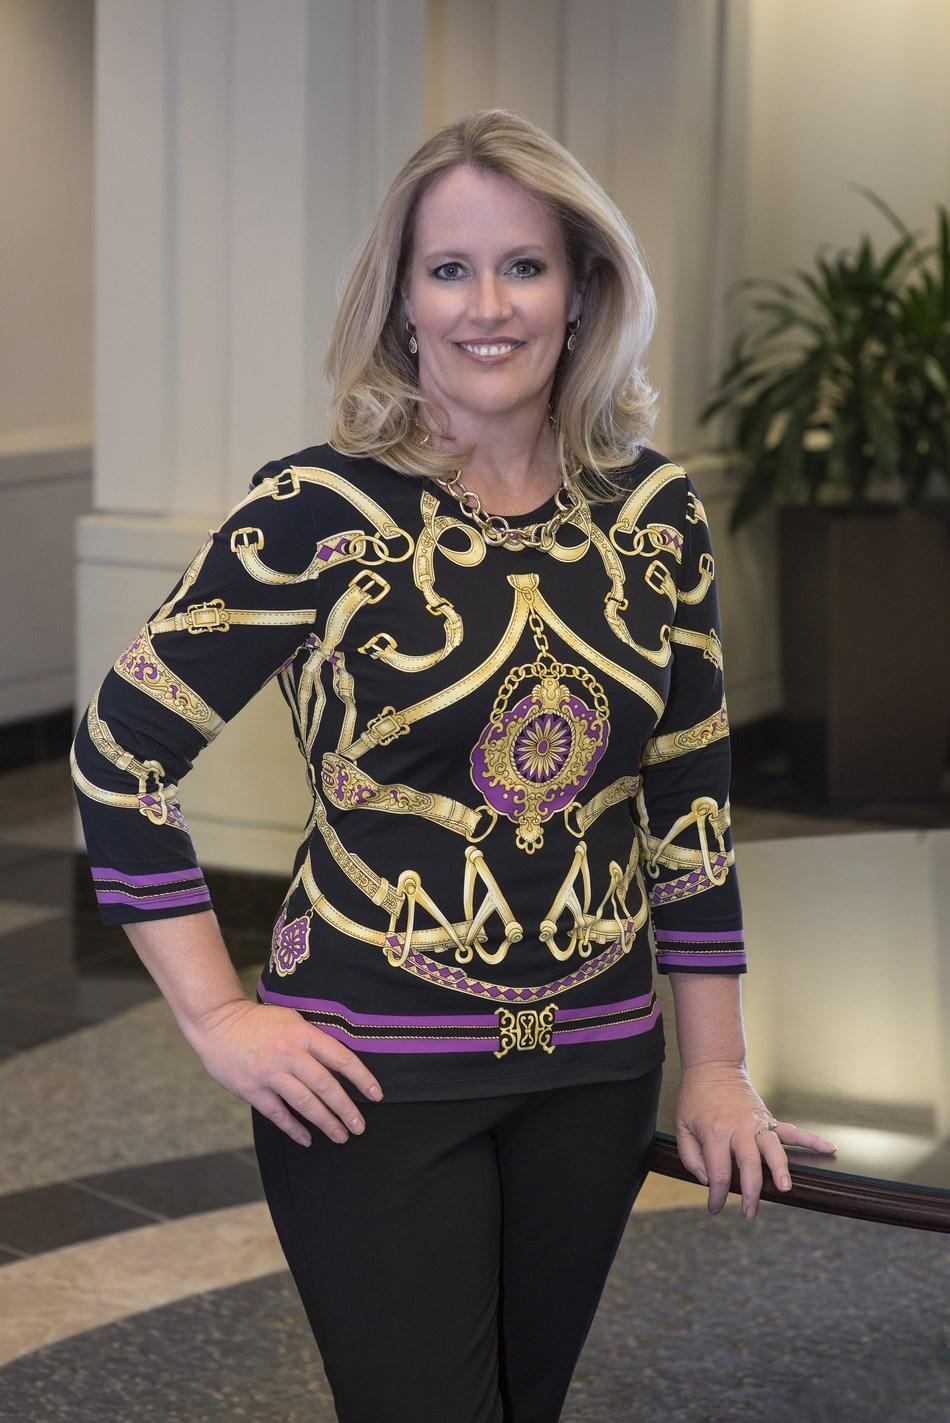 Pauline Bennett, president of Coldwell Banker Residential Brokerage North Carolina and South Carolina